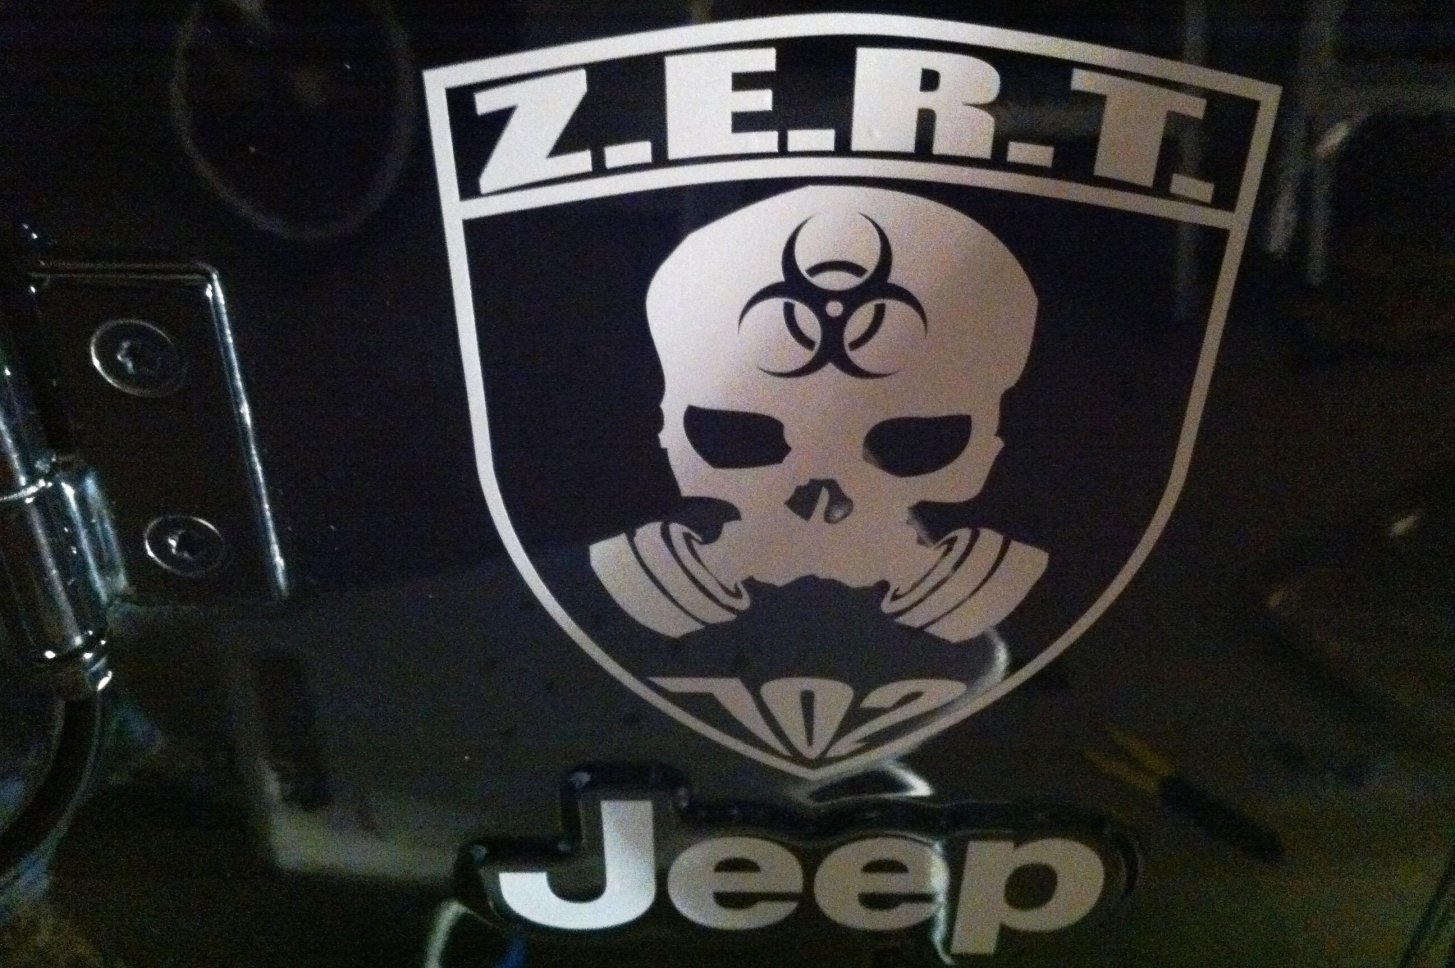 jeep-zert.jpg